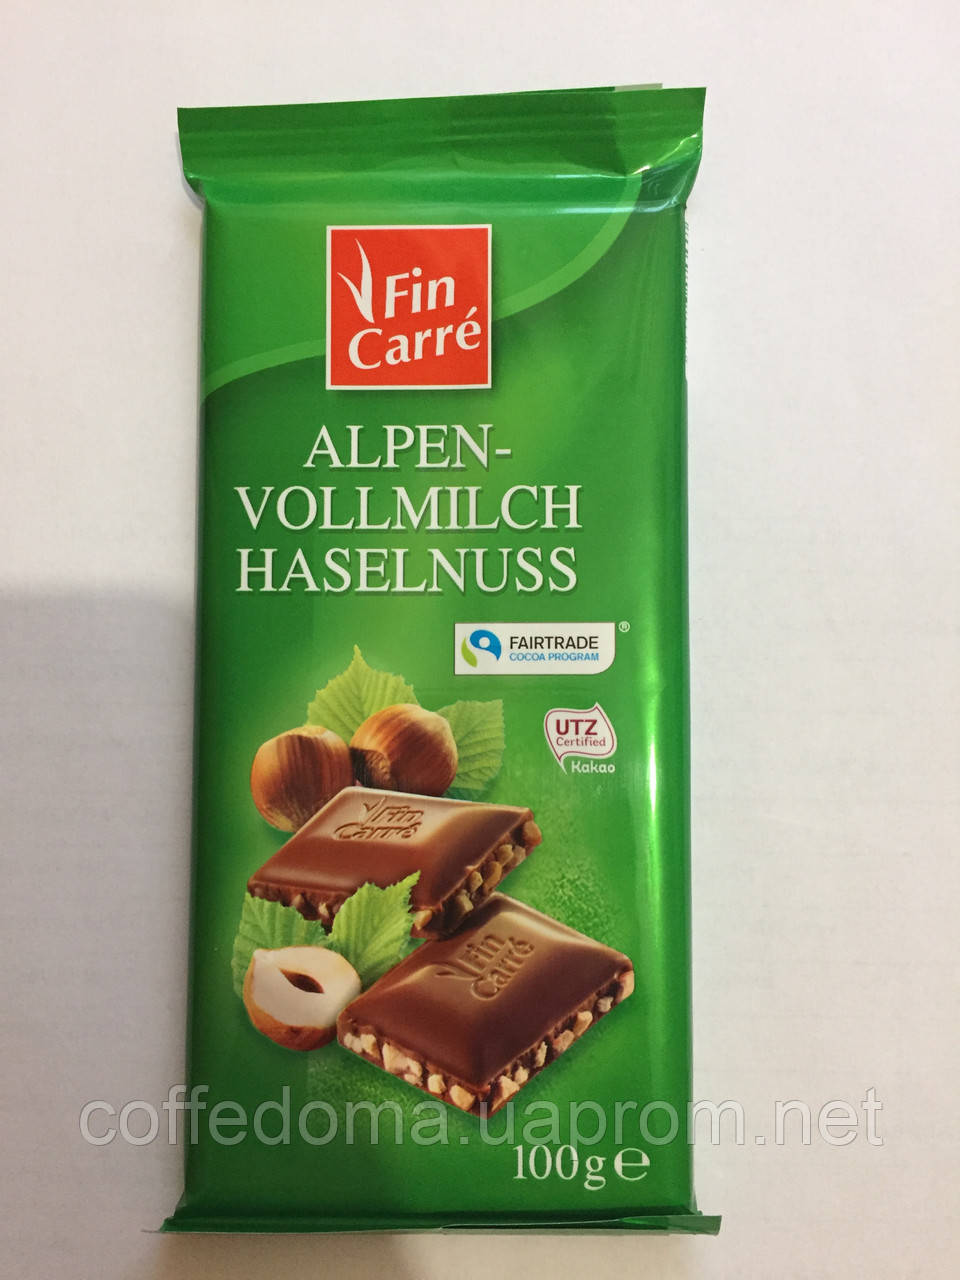 Fin Carre Alpen-vollmilch Haselnuss молочный шоколад с орешком 100 грамм